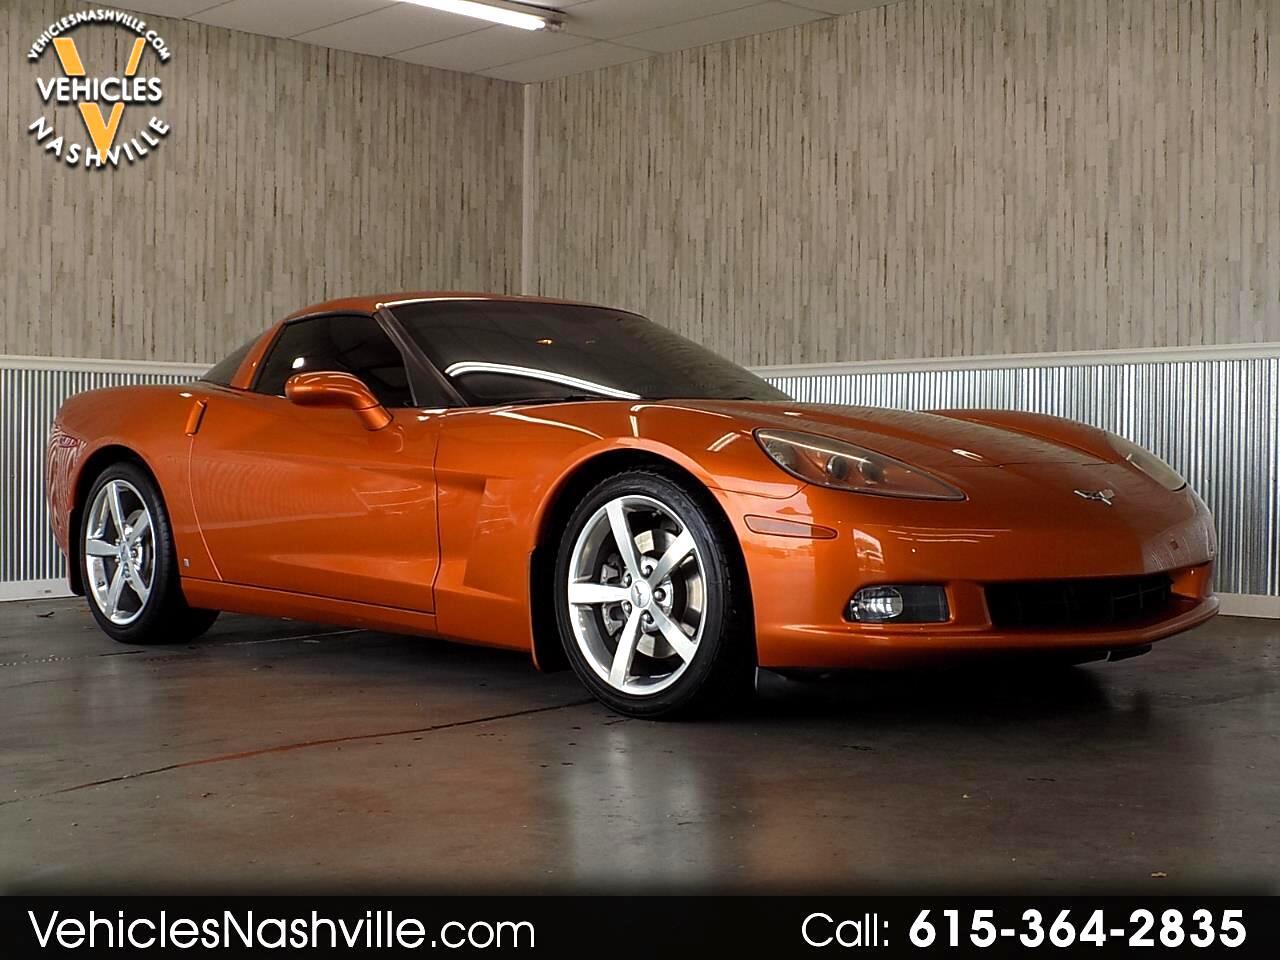 2008 Chevrolet Corvette Coupe LT1